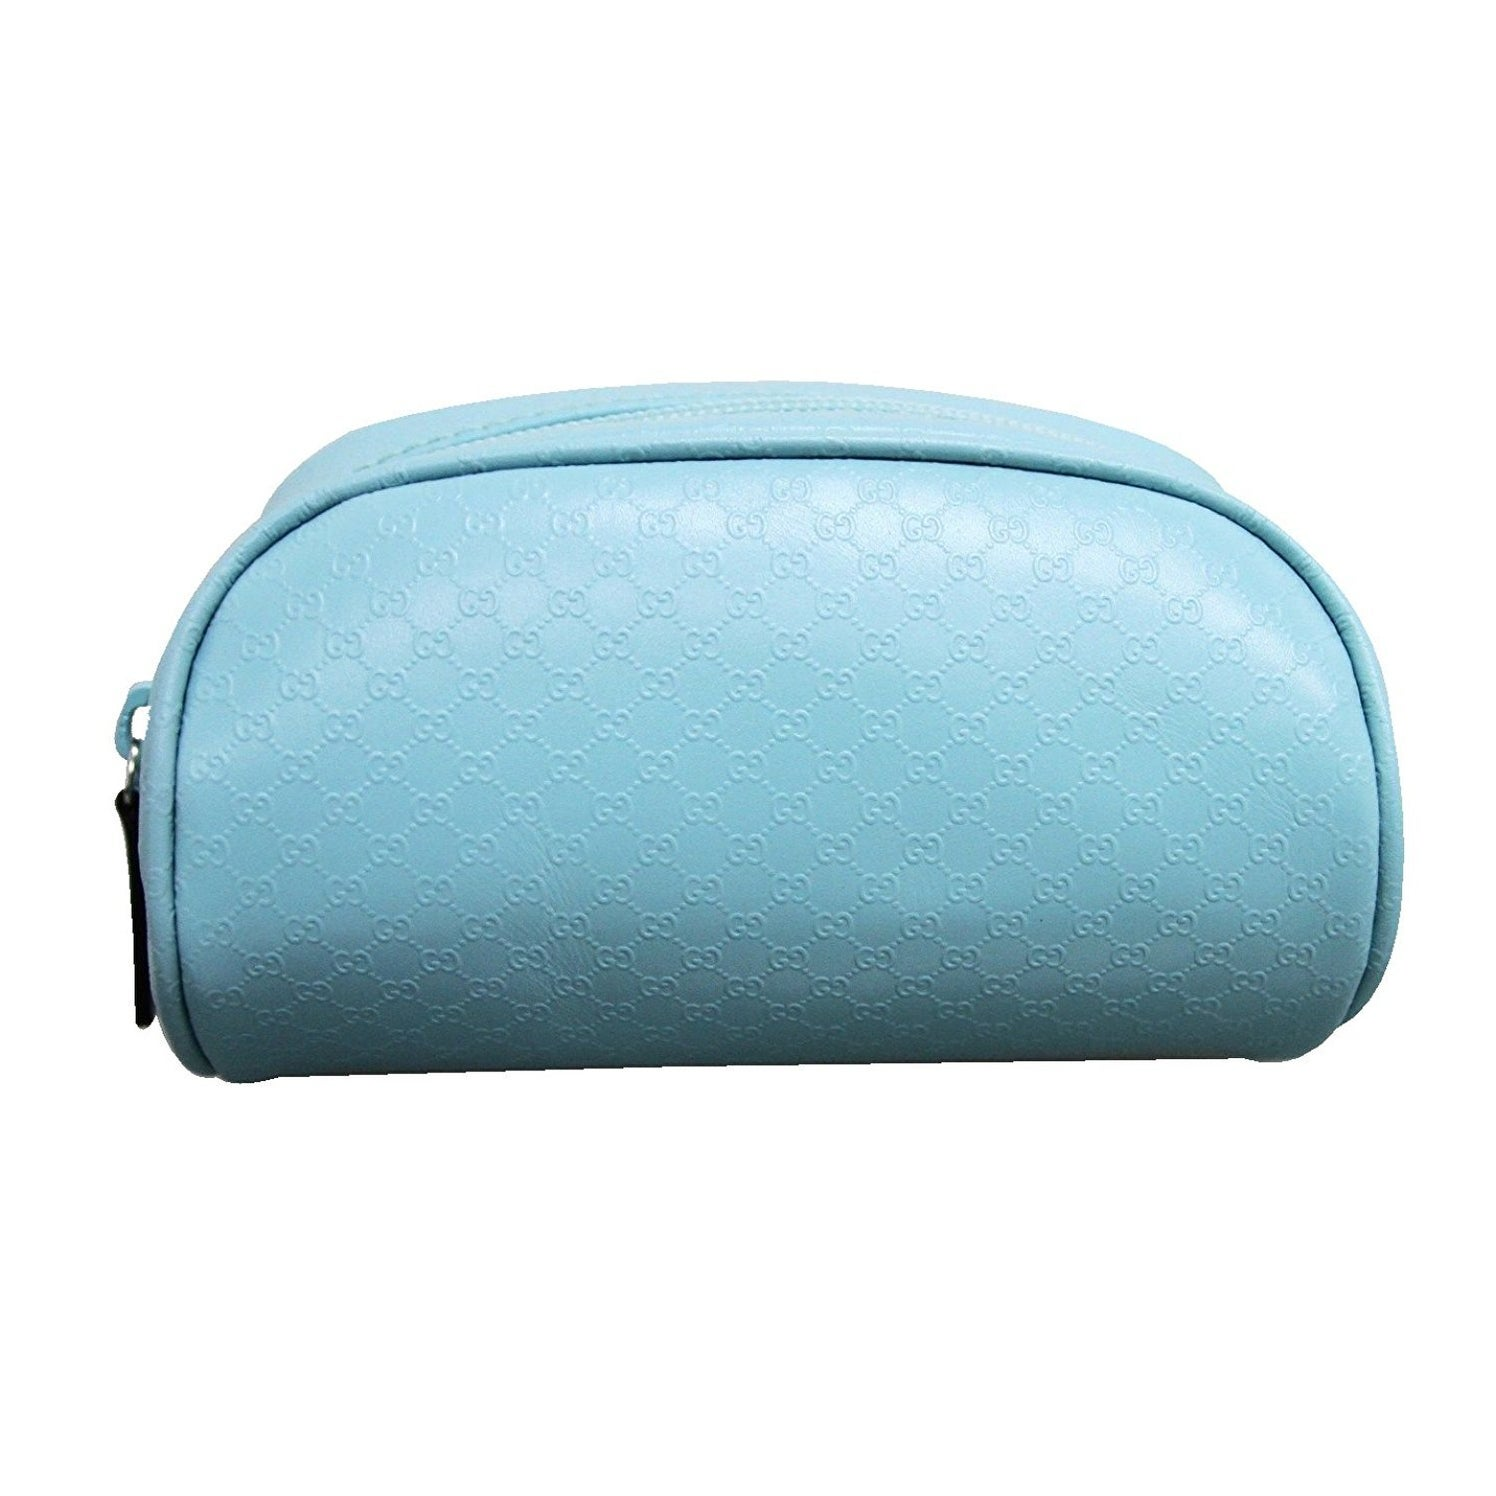 2ae6c02f187 Gucci Designer Handbags